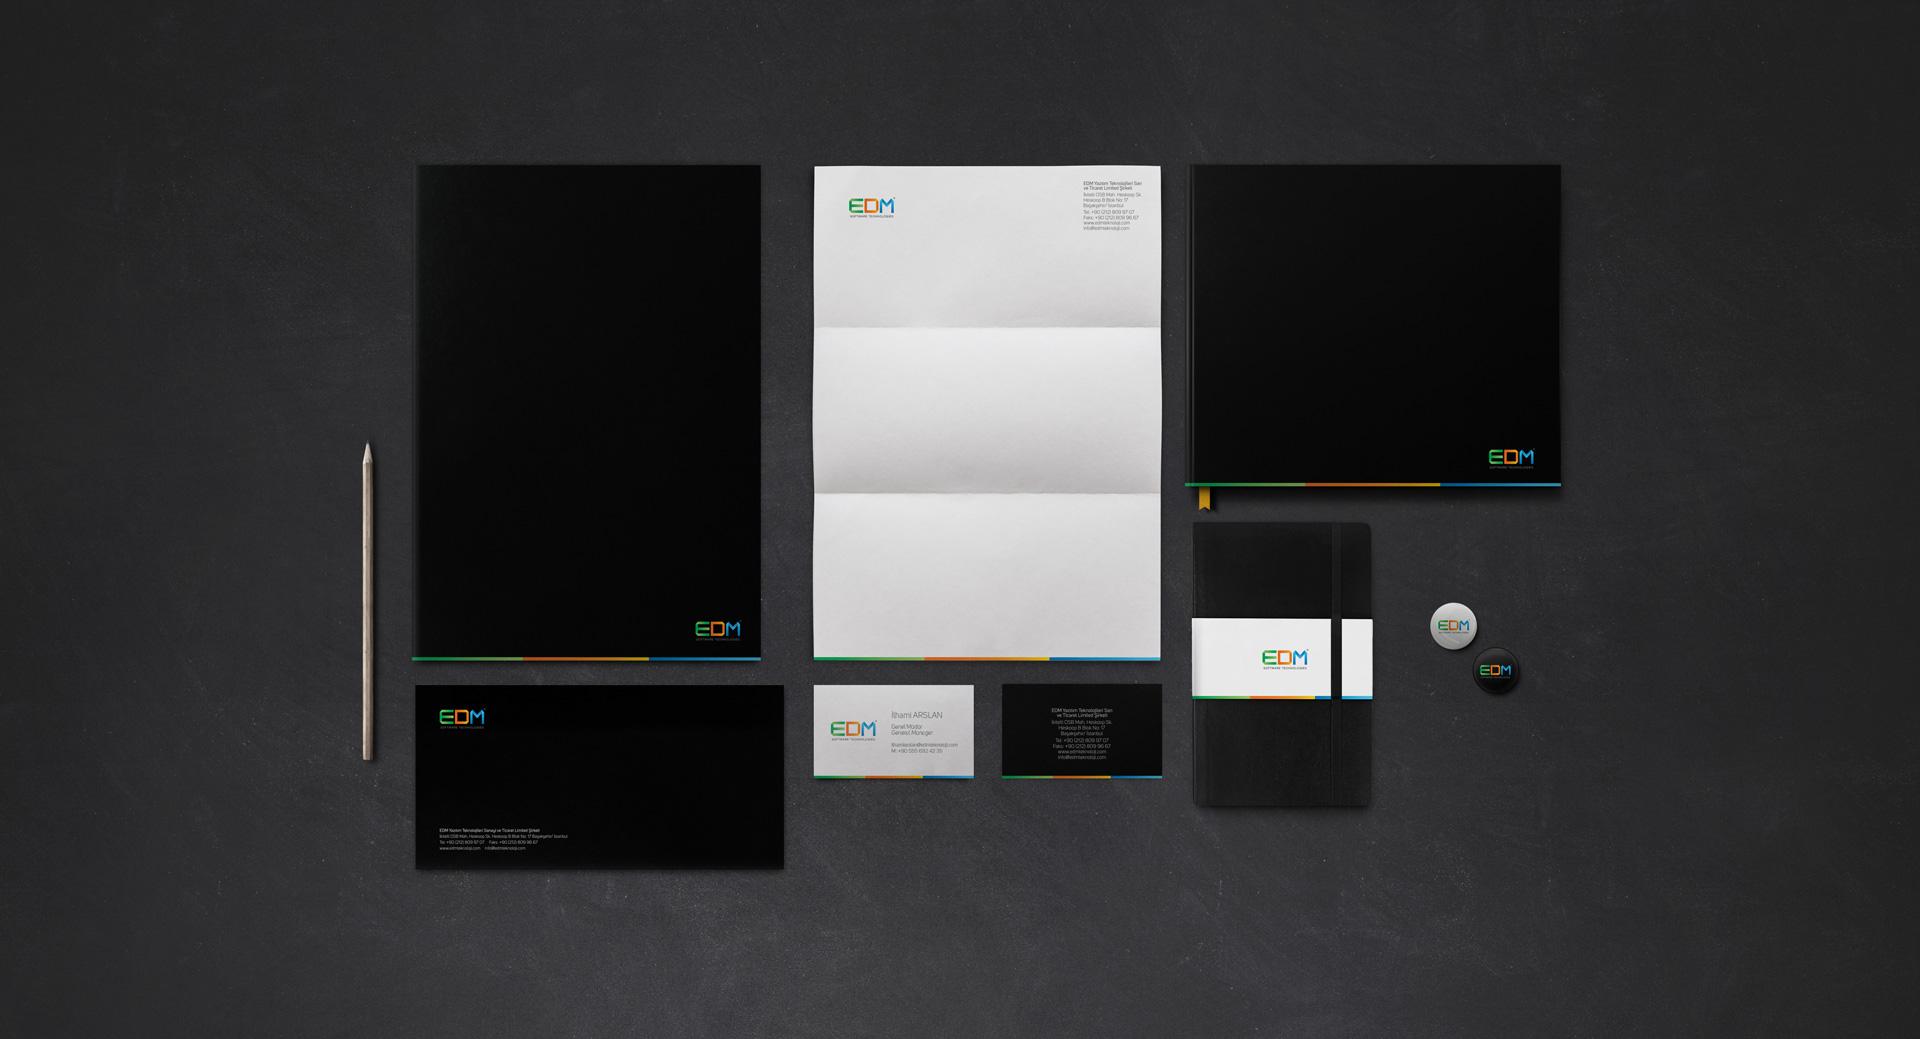 edm-branding-stationary-design-aydin-ozon